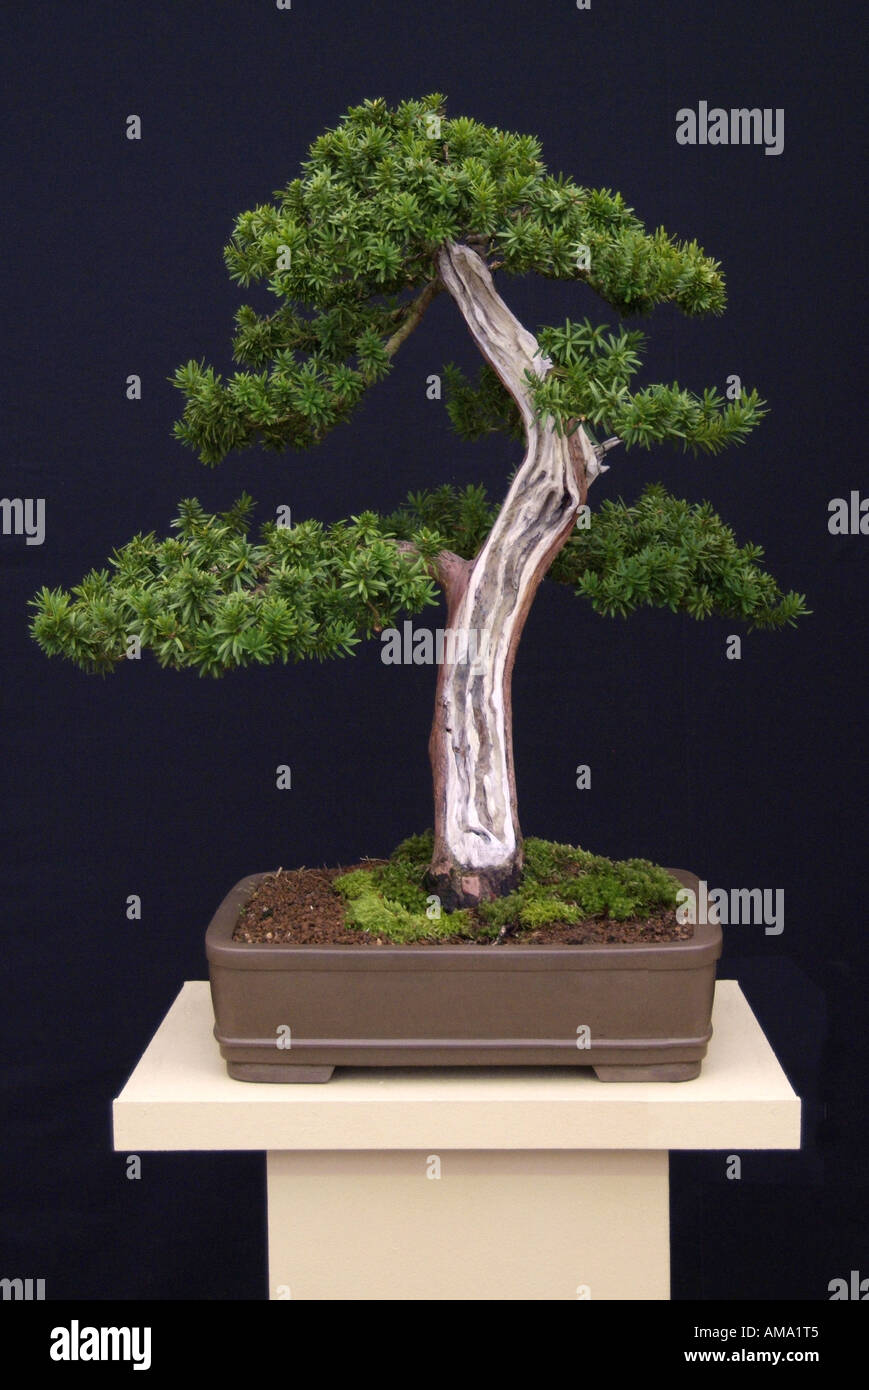 Taxus cuspidata tejo japonés bonsai Chino China Japón japonés Timor oriental orient árbol perennifolio enano miniatura shr Foto de stock